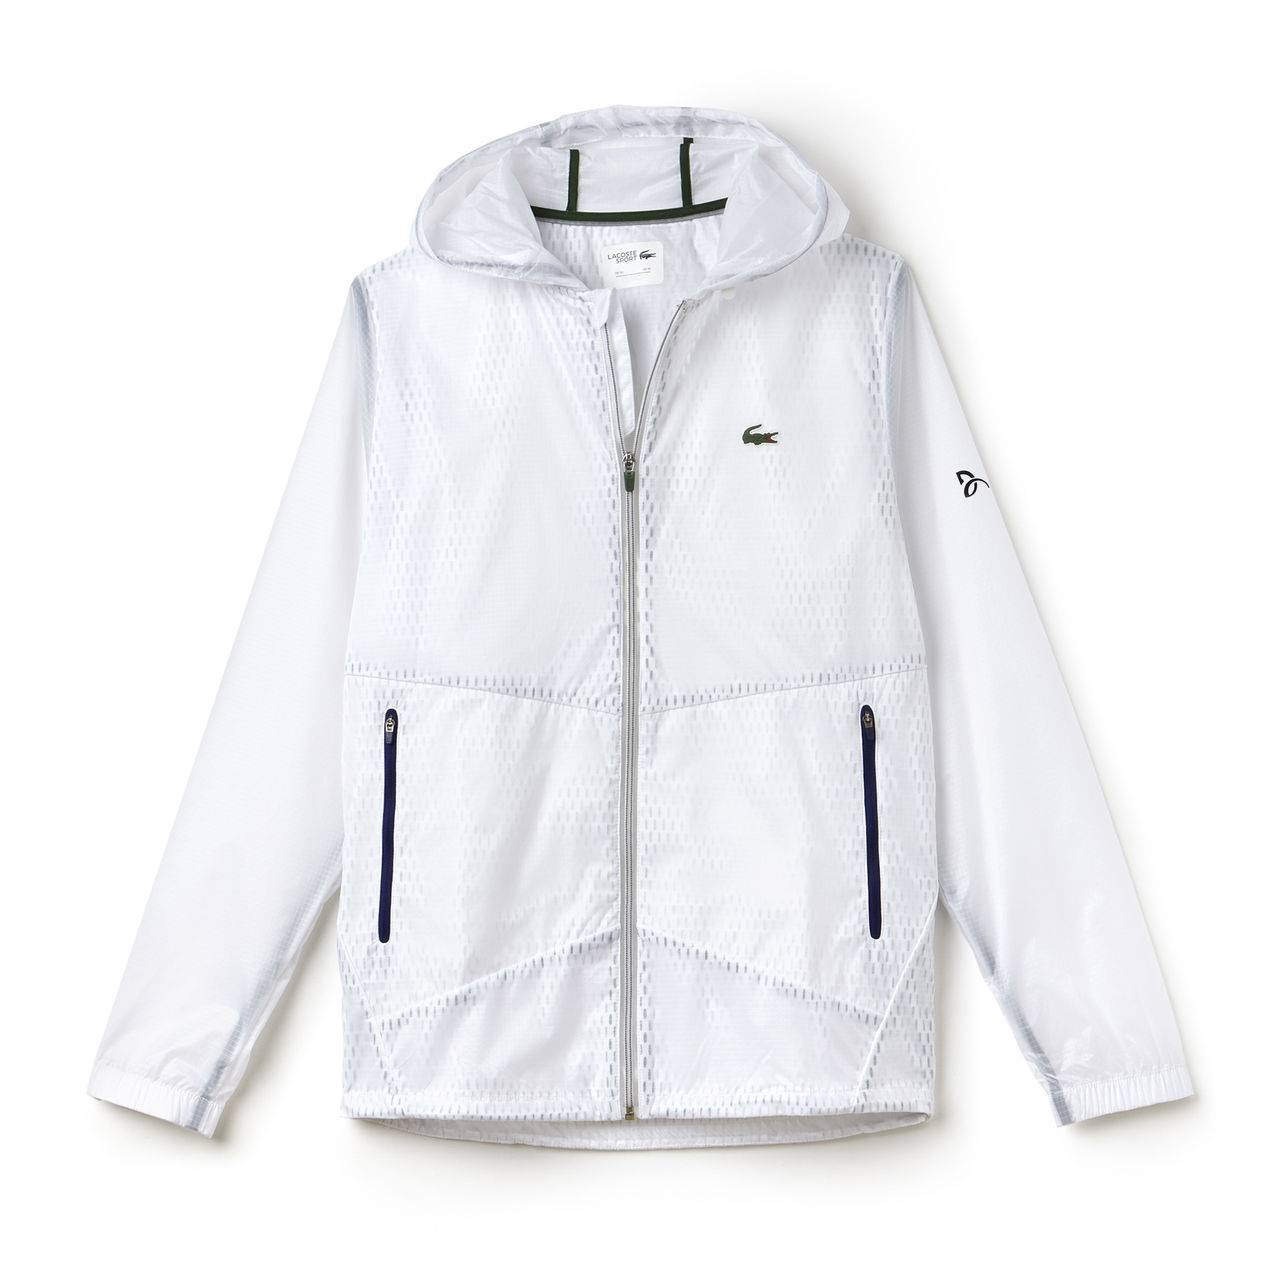 Lacoste Novak Djokovic Jacket Exclusive Edition White L